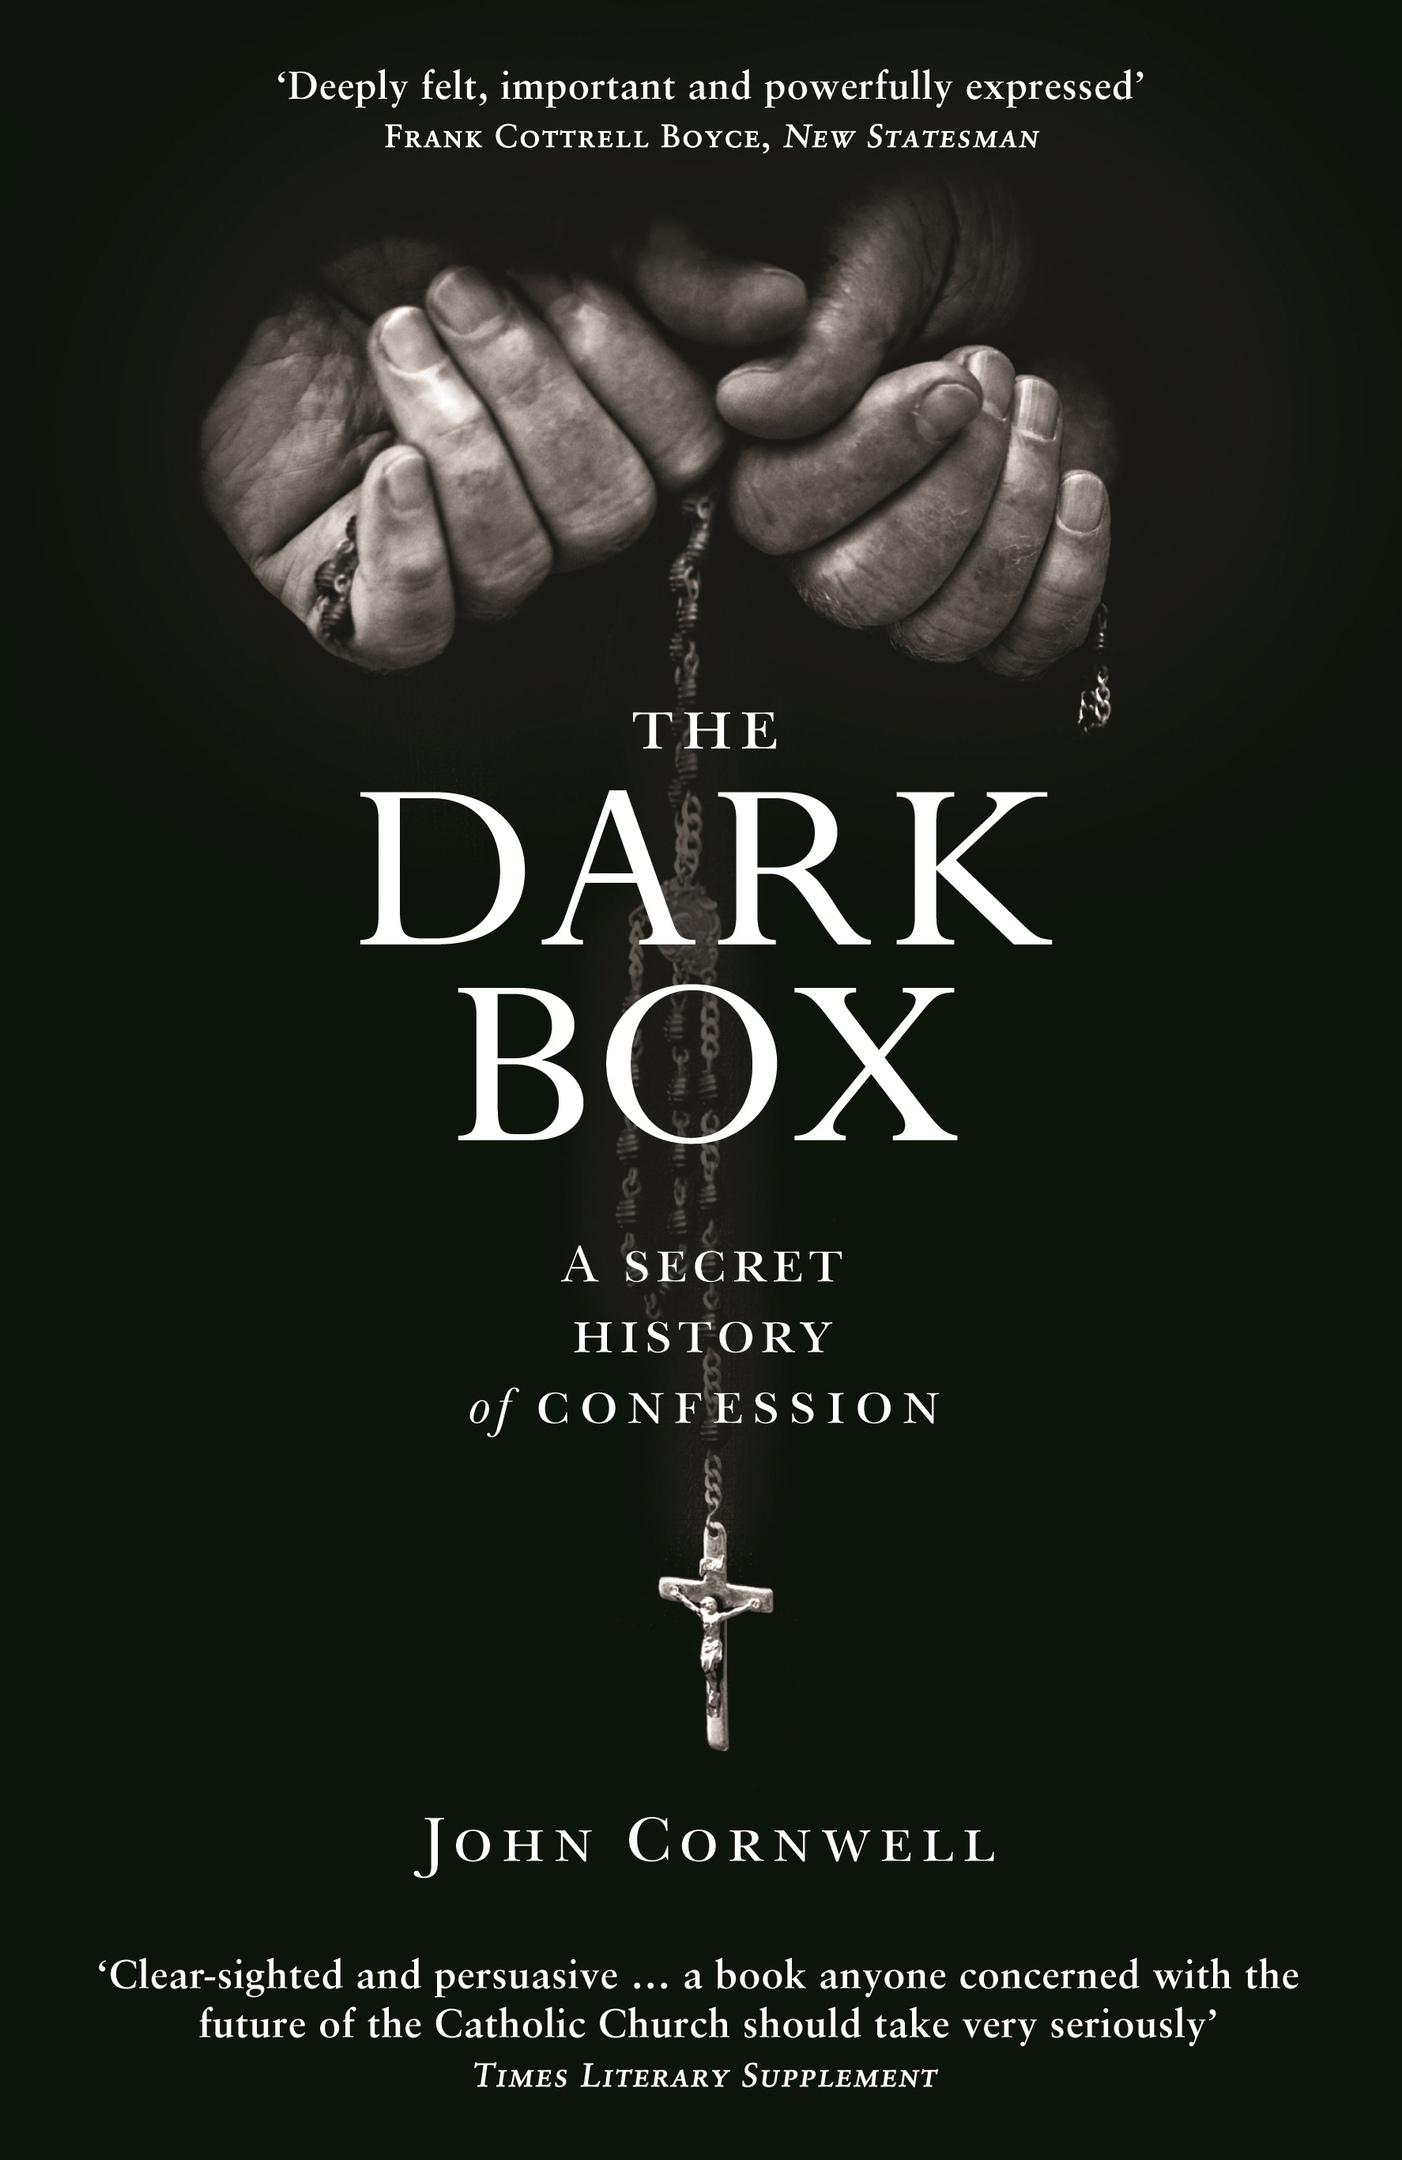 John Cornwell – The Dark Box Genre: